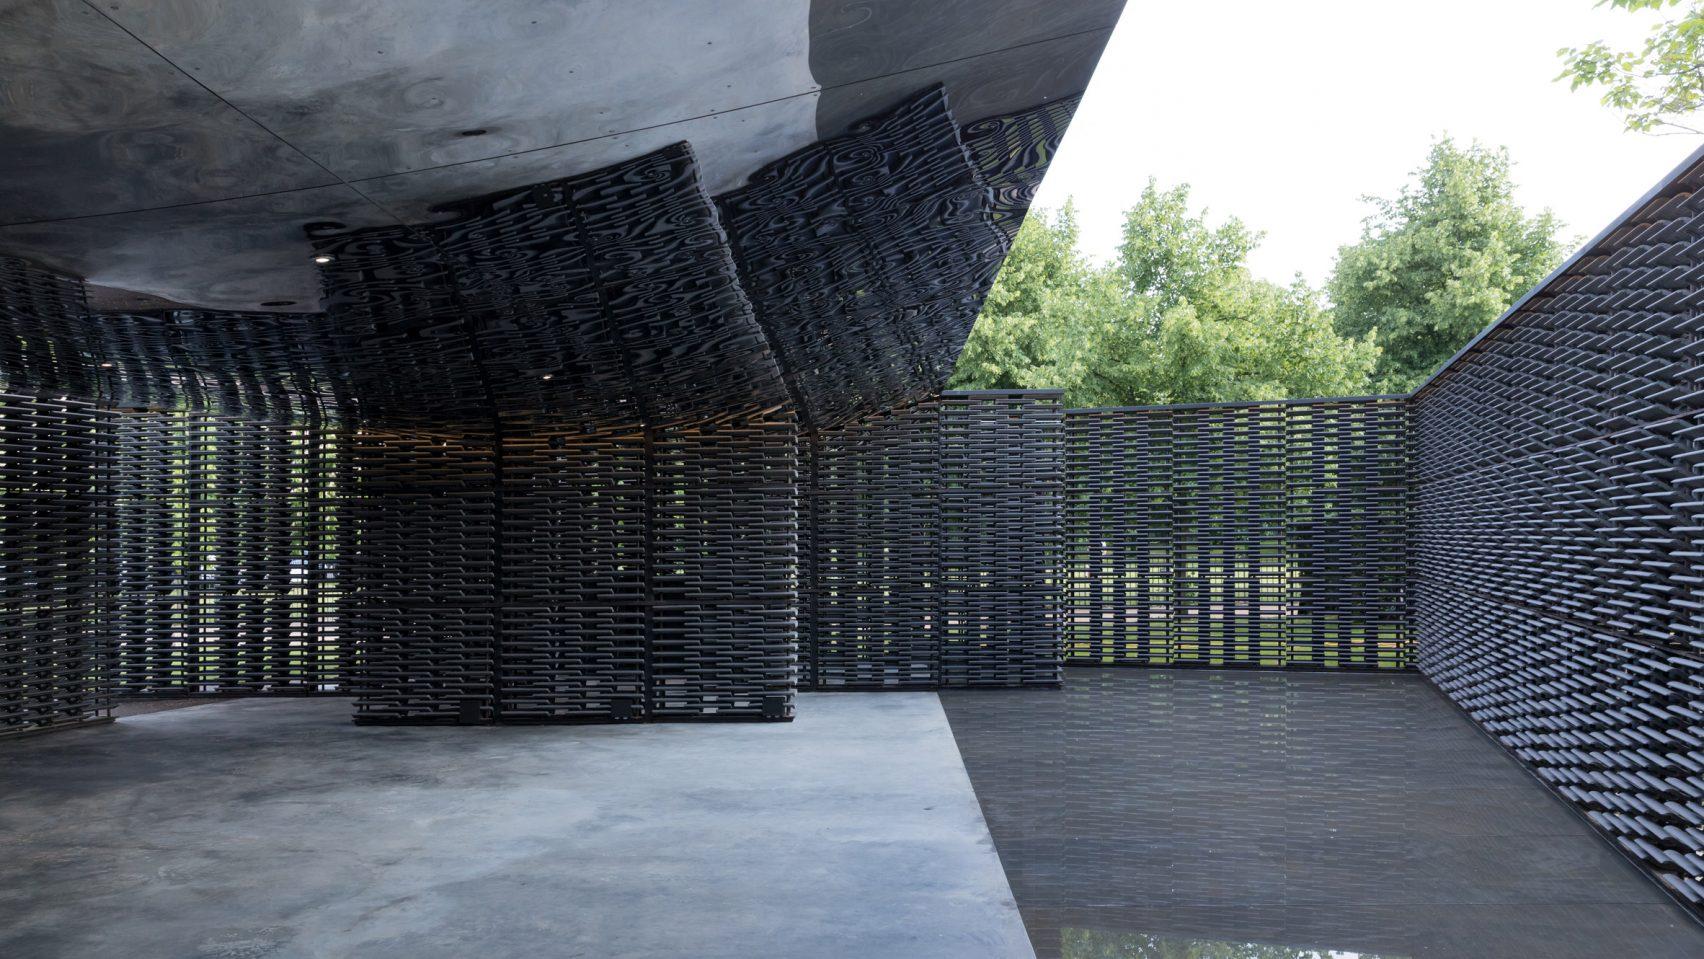 serpentine-pavilion-frida-escobedo-iwan-baan-01